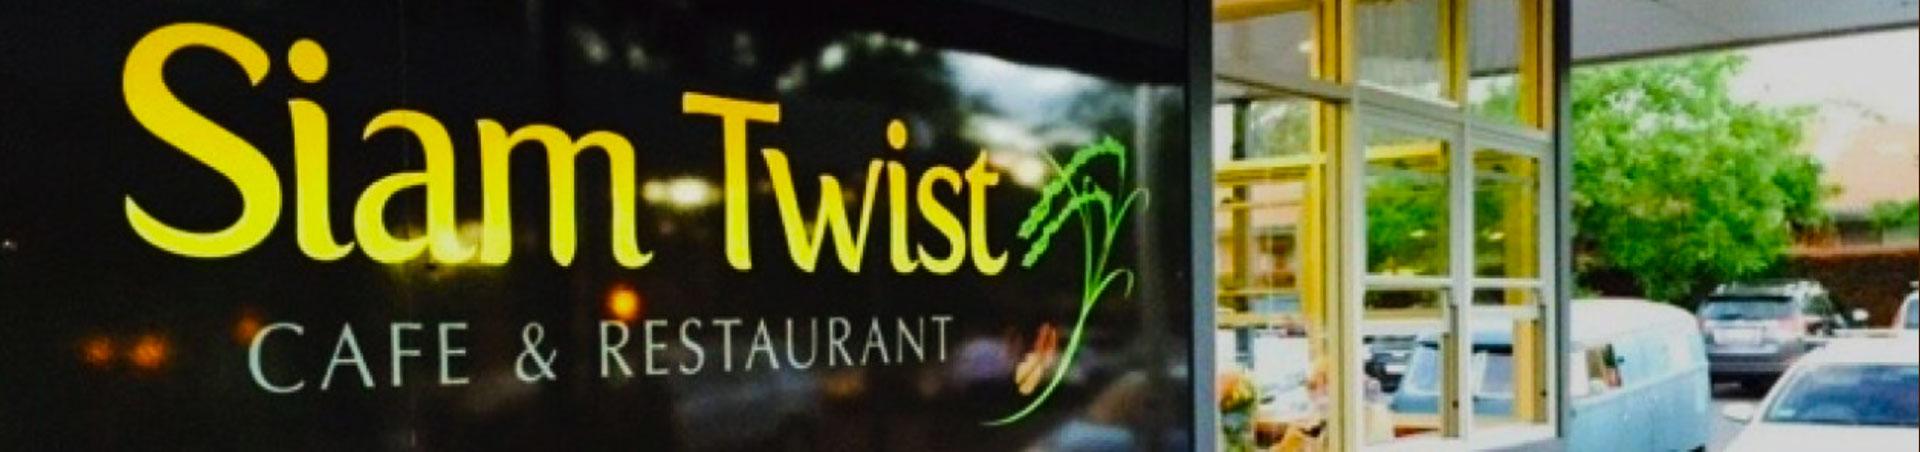 SiamTwist Cafe & Restaurant